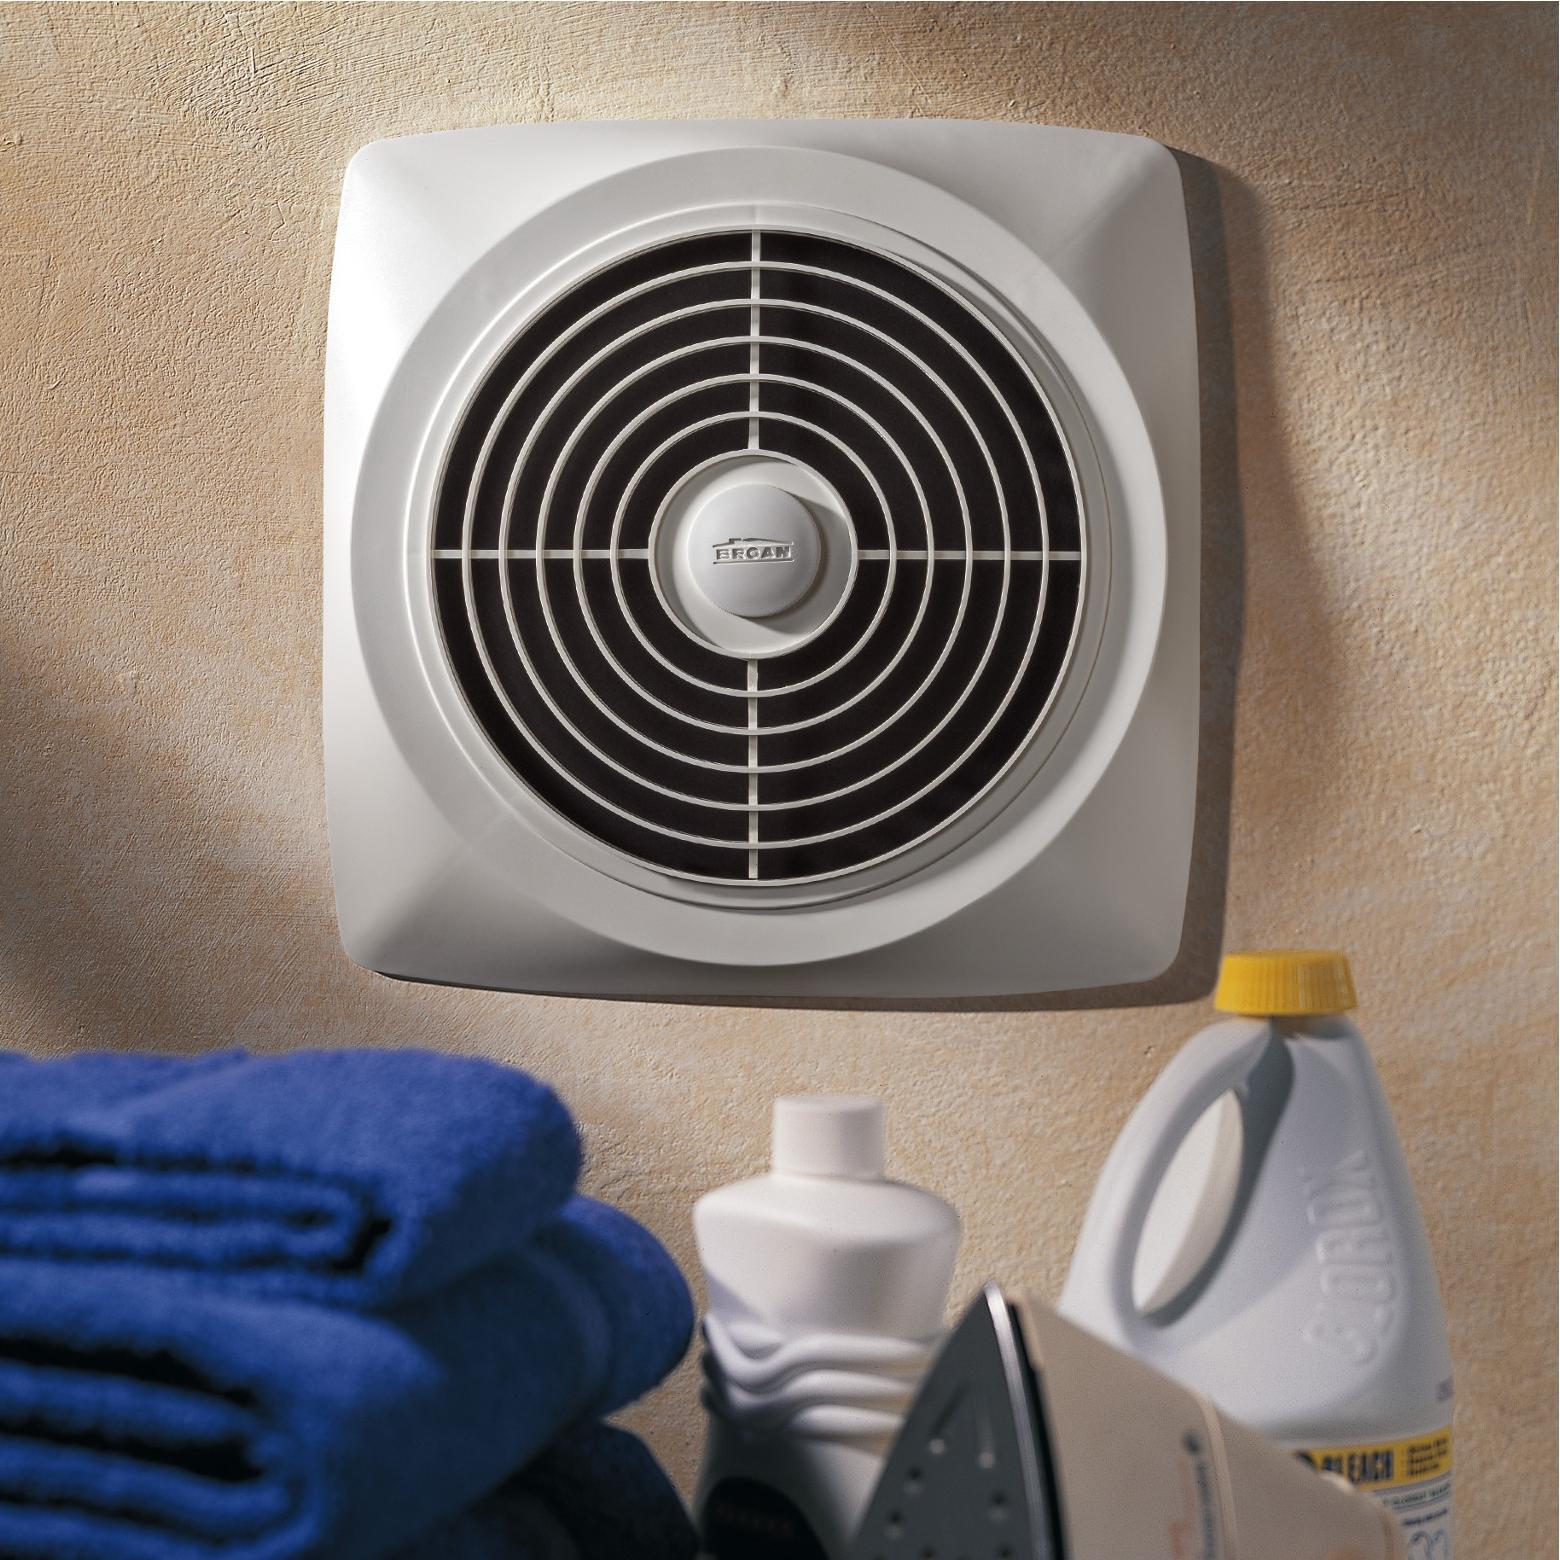 Broan-Nutone 507 Chain-Operated Ventilation Fan, Plastic White Square  Exhaust Fan, 7.0 Sones, 250 CFM, 8\